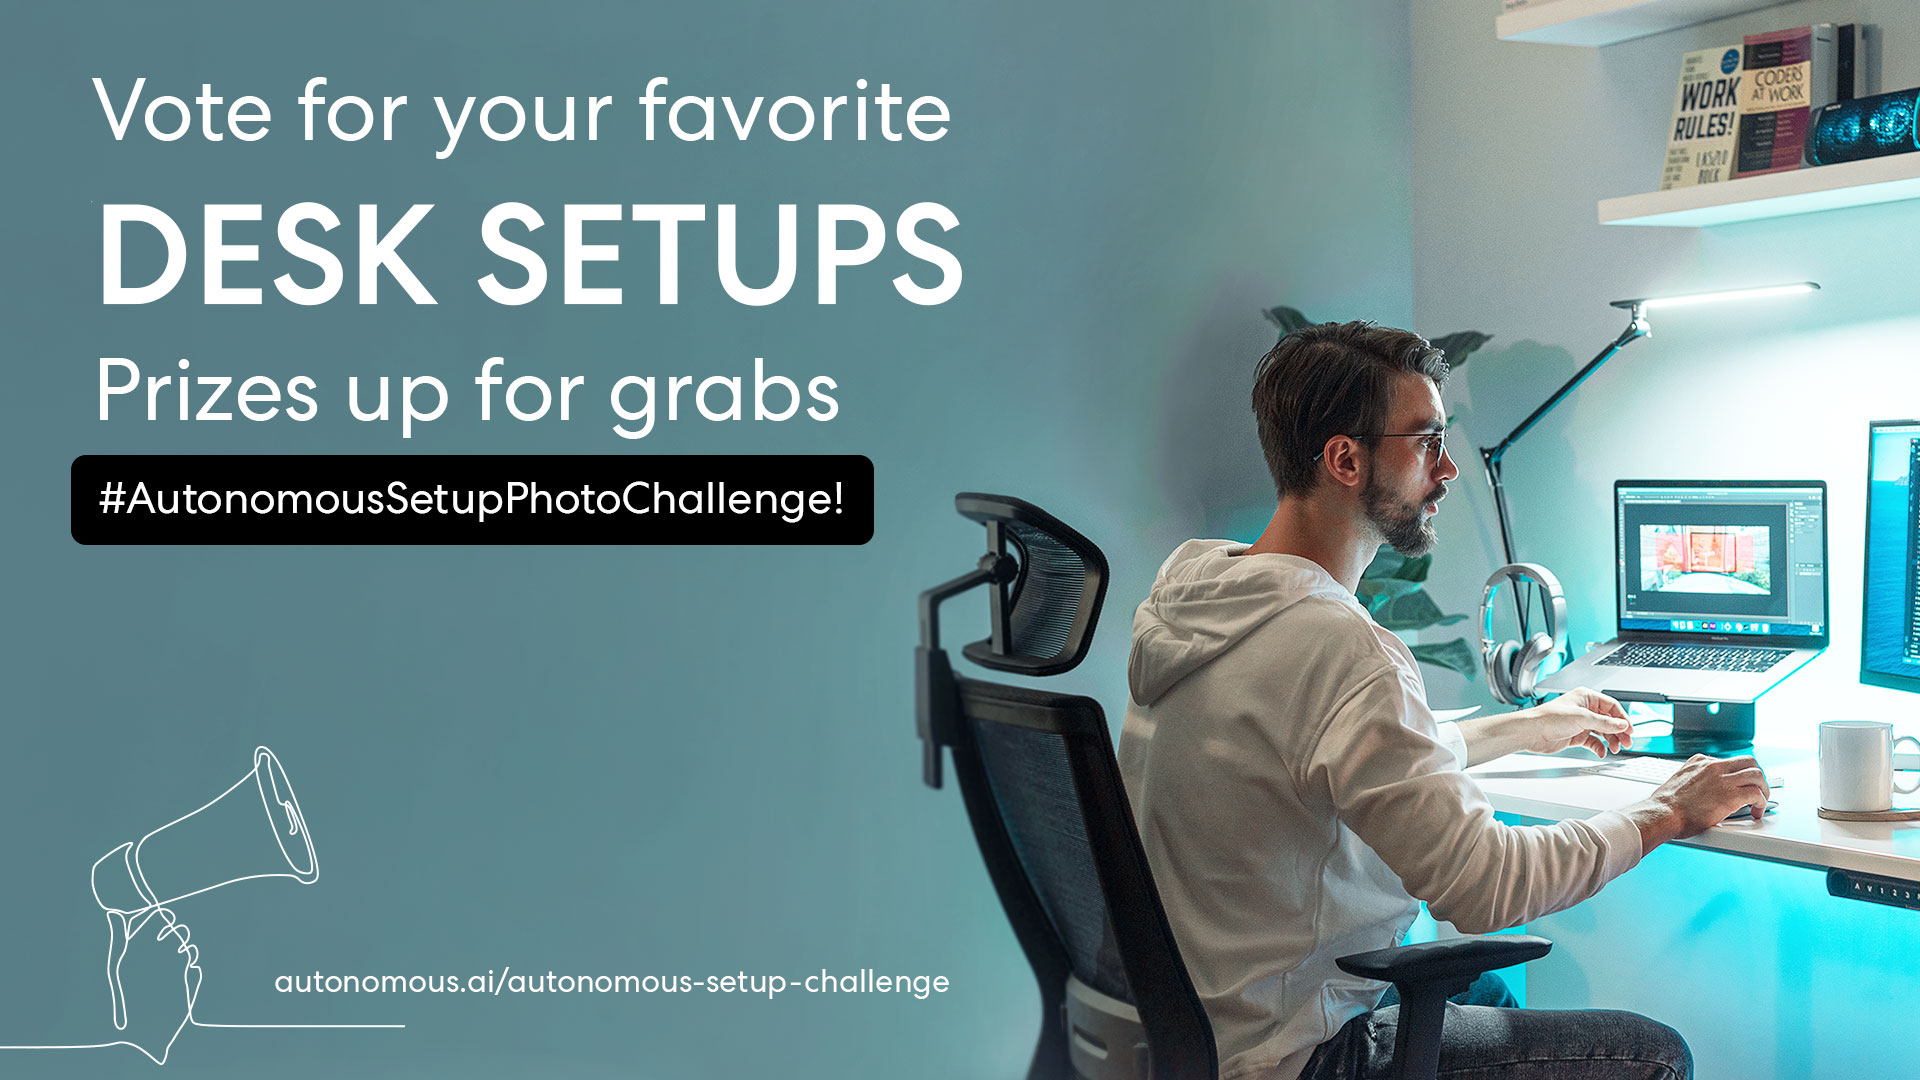 Desk setup photo challenge